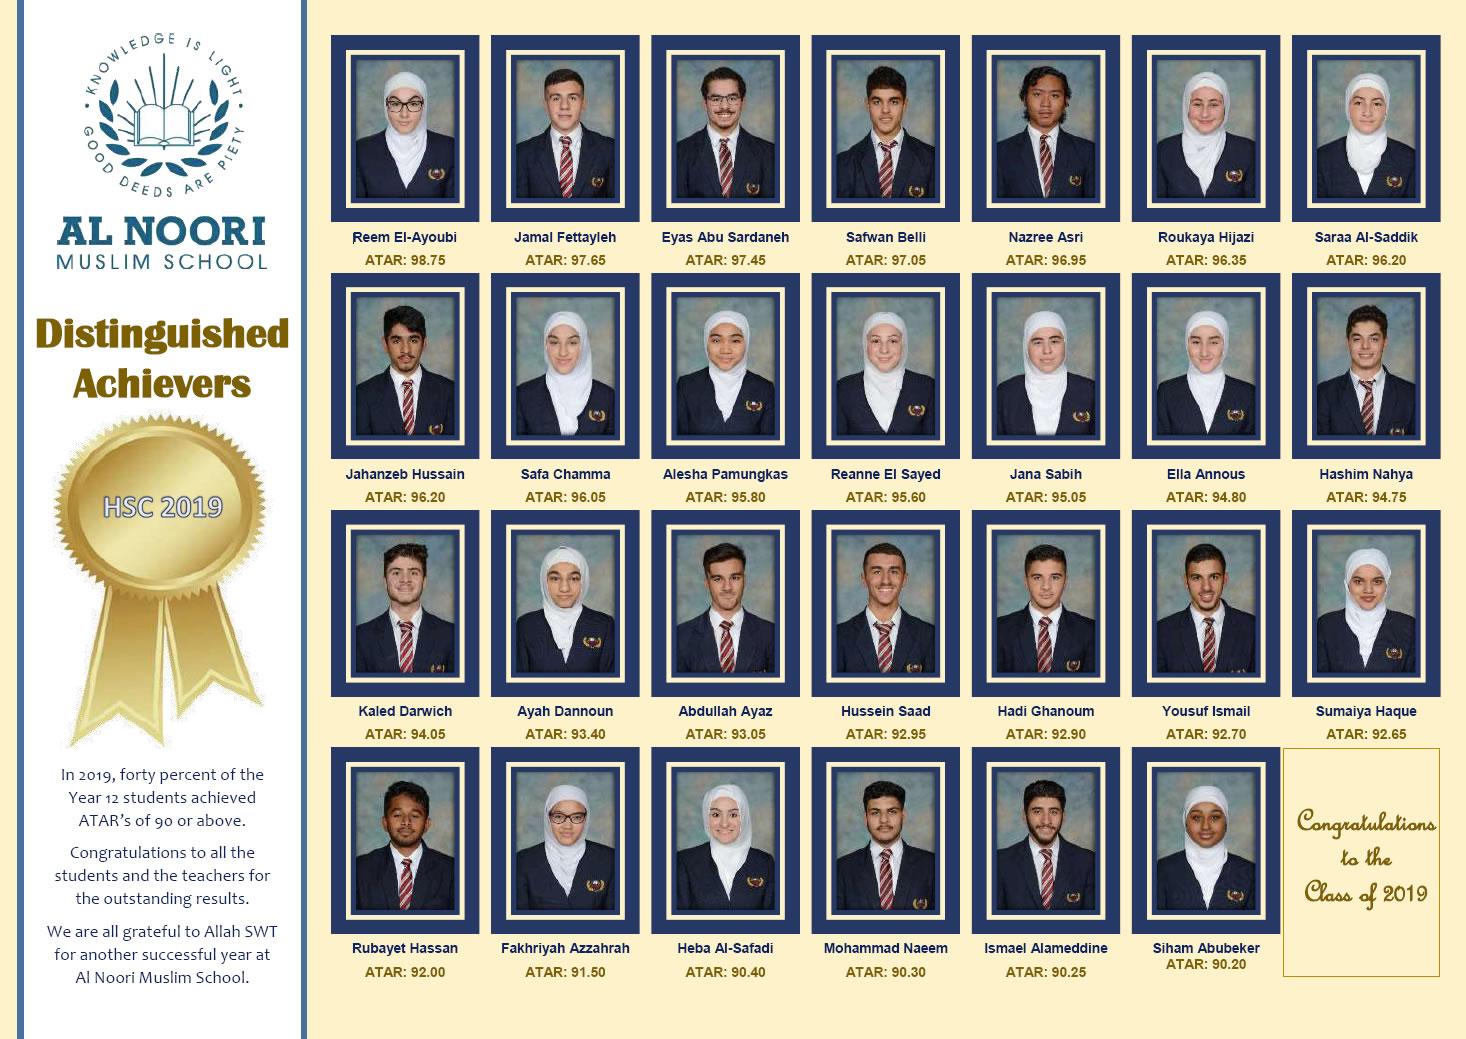 Al Noori Muslim School 2019 Outstanding Achievements HSC Results